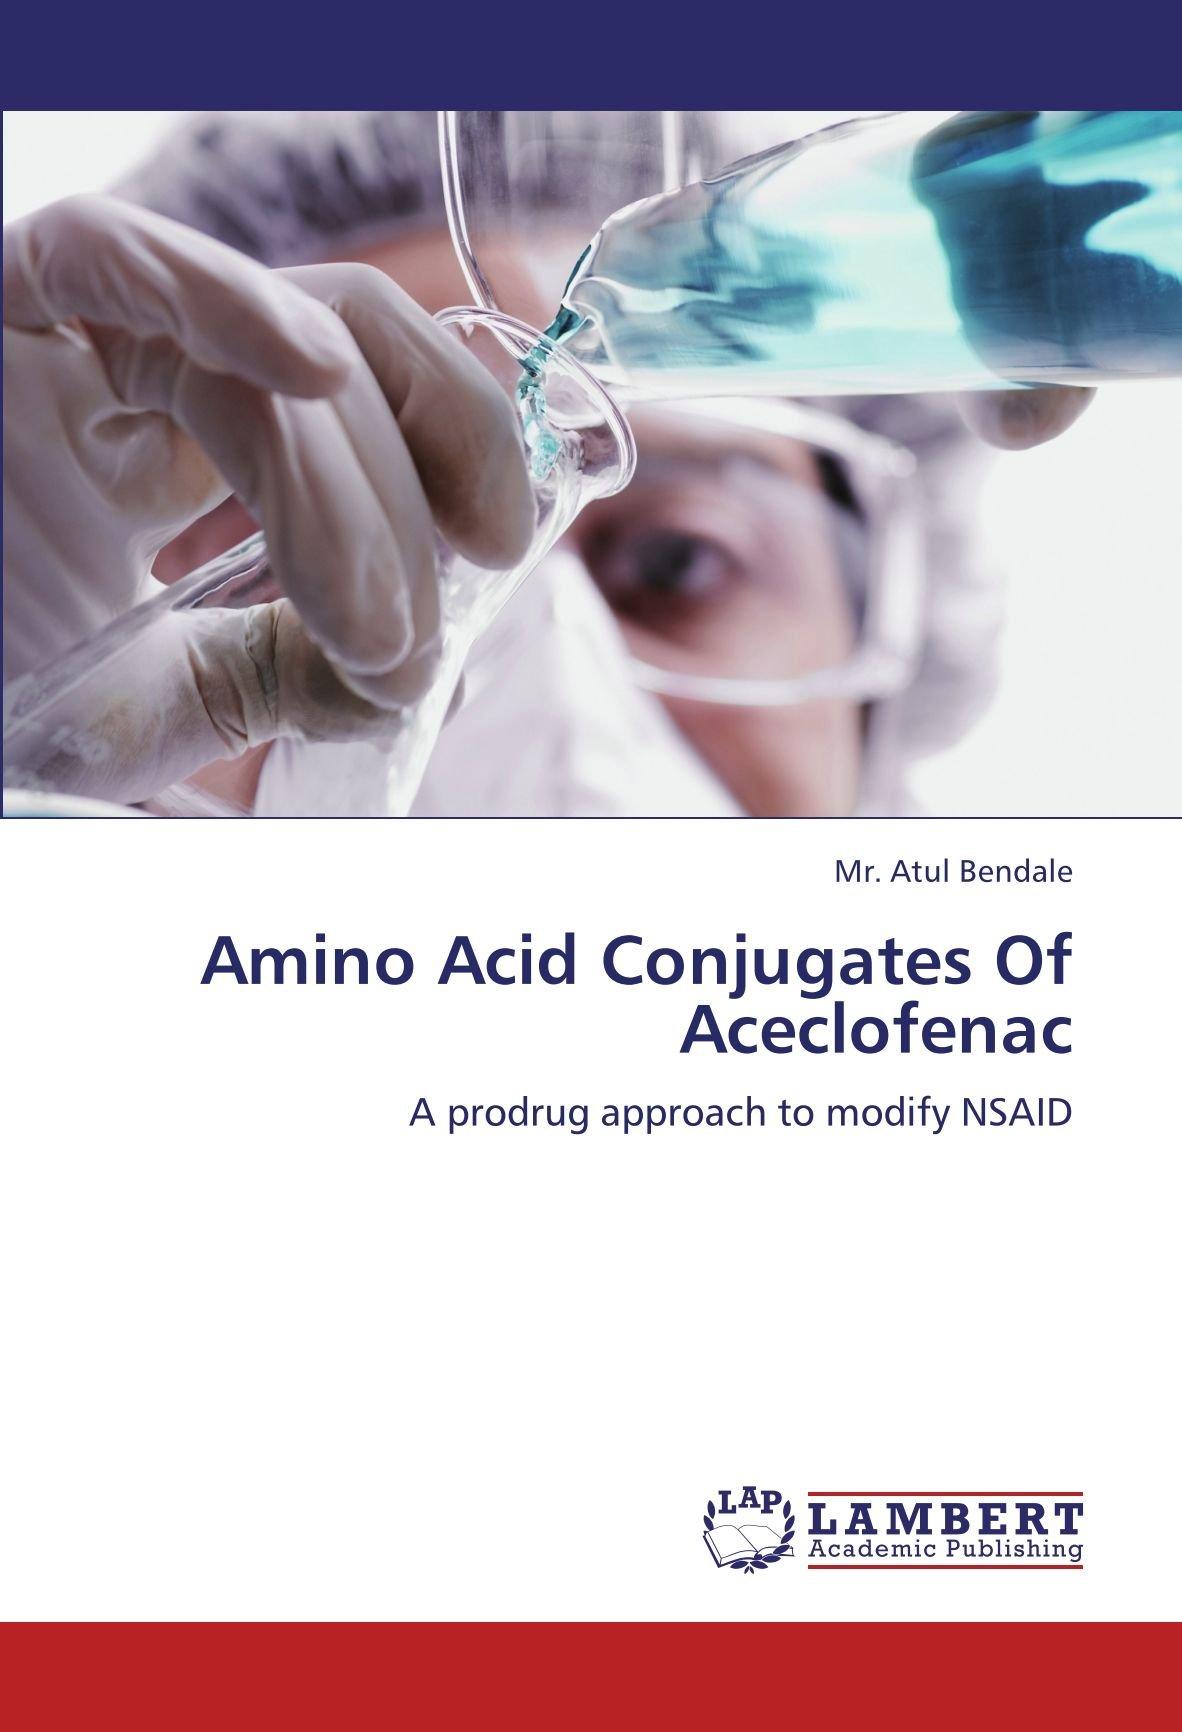 Amino Acid Conjugates Of Aceclofenac: A prodrug approach to modify NSAID PDF